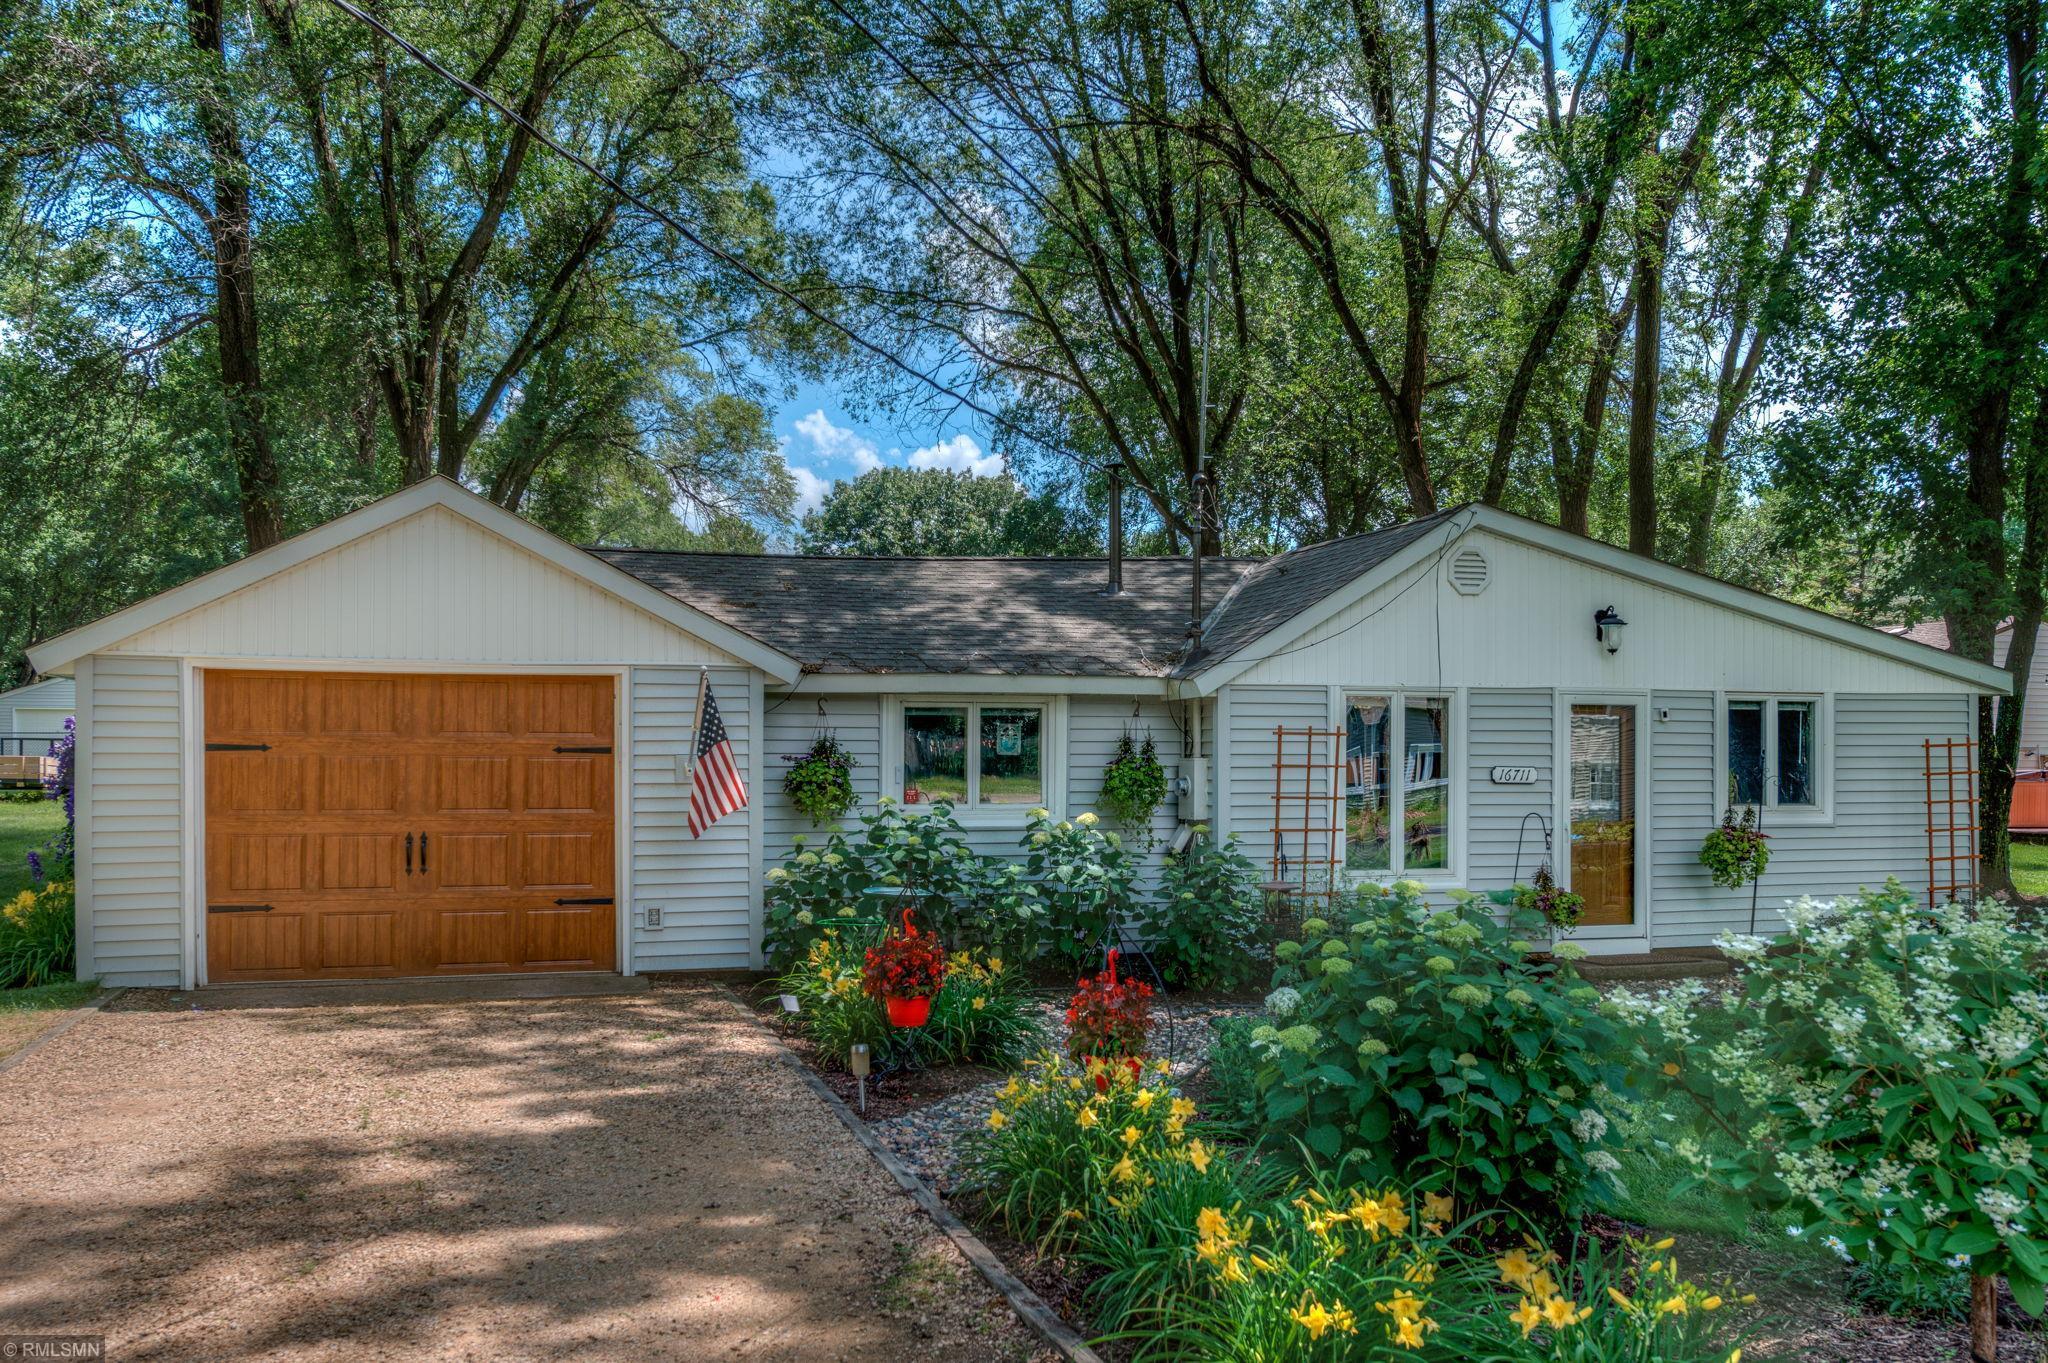 16711 4th N Property Photo - Lakeland, MN real estate listing